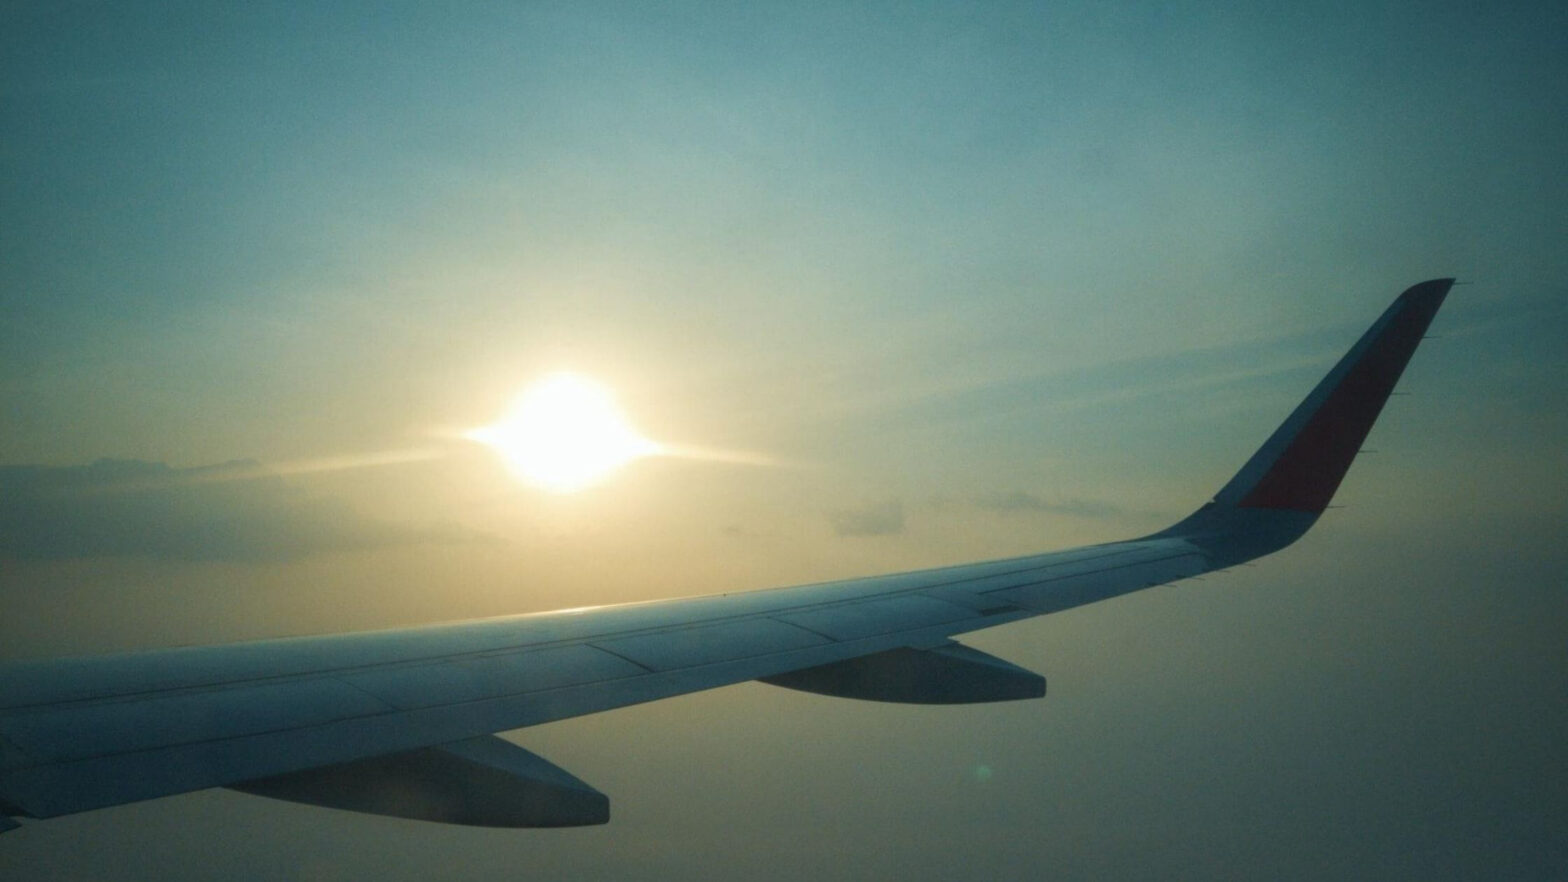 Bali International Airport (Code, Name, Flights, Hotel & Resorts, Transfers)